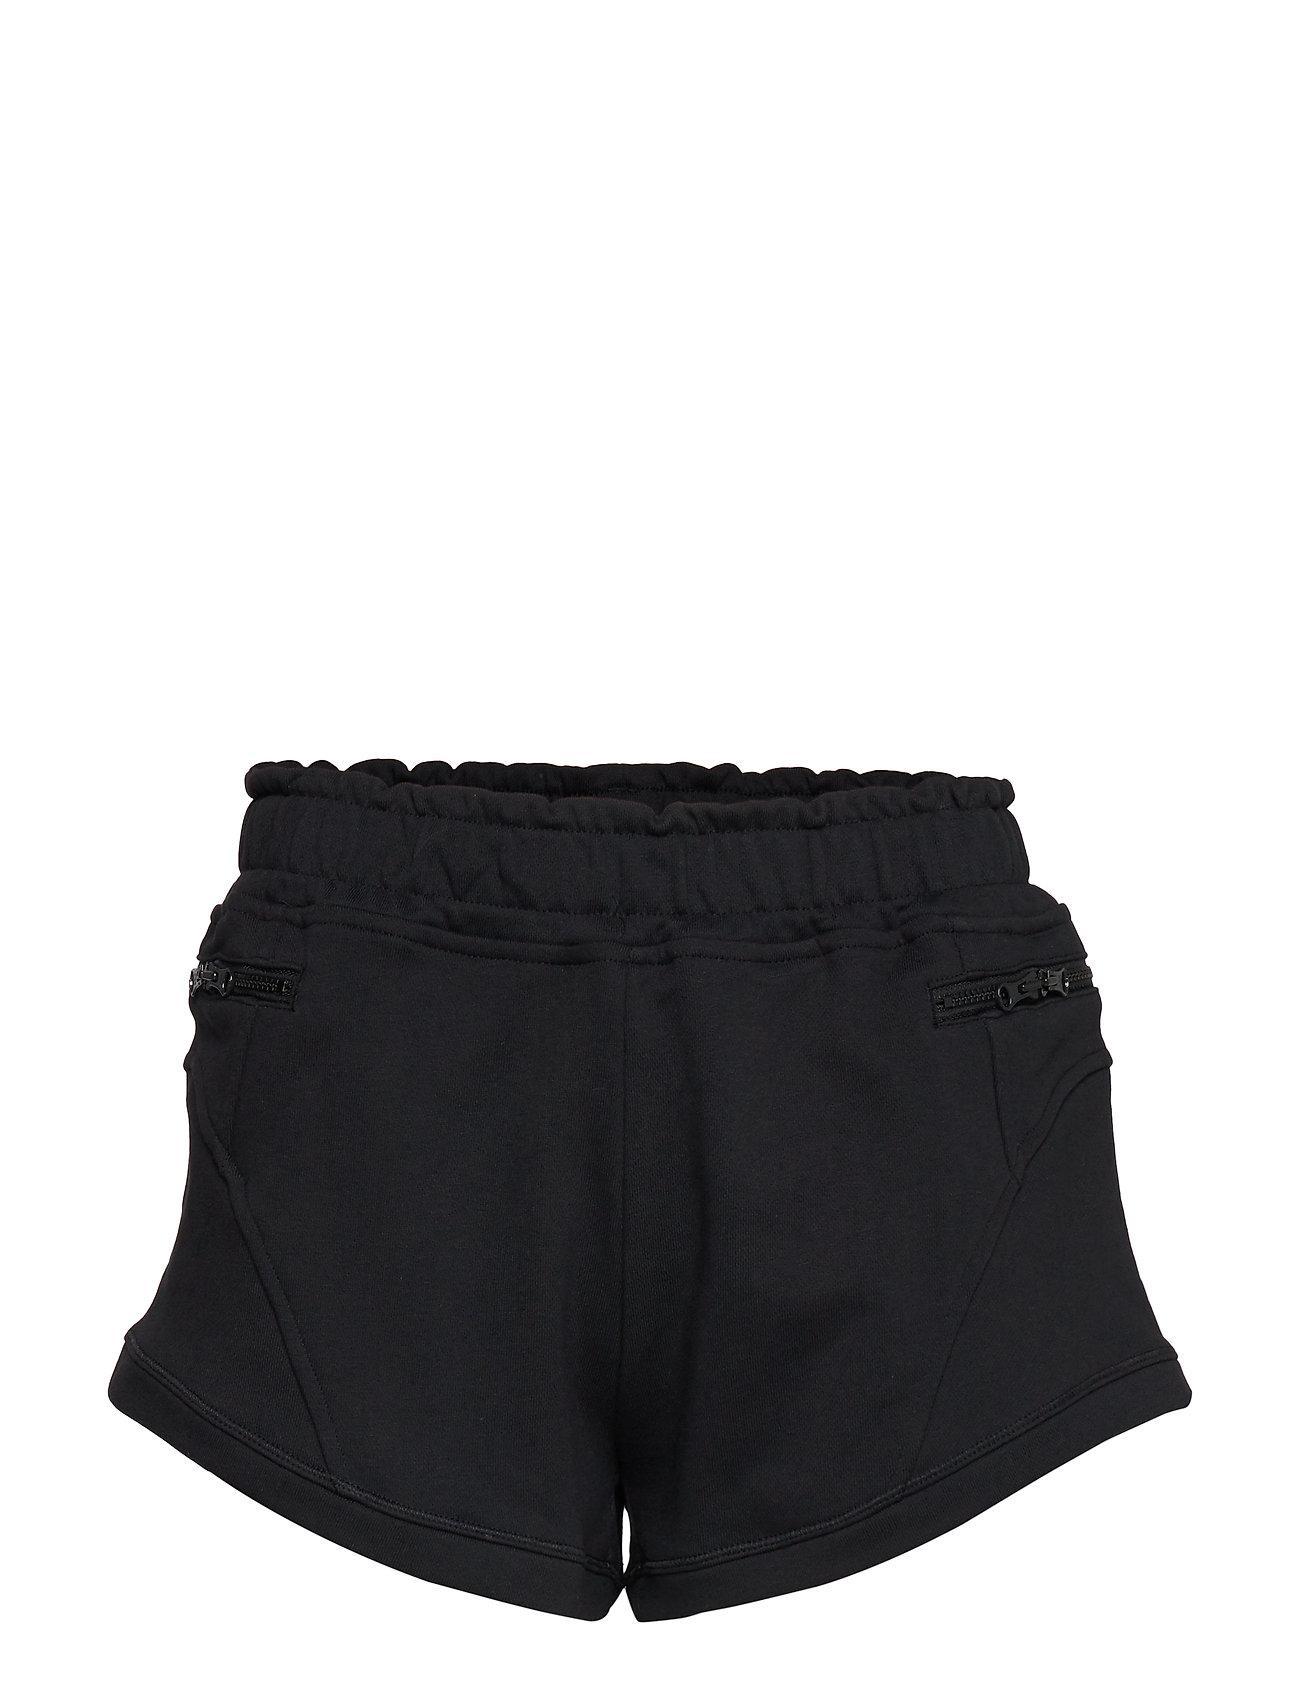 adidas by Stella McCartney ATHLETICS SHORT - BLACK